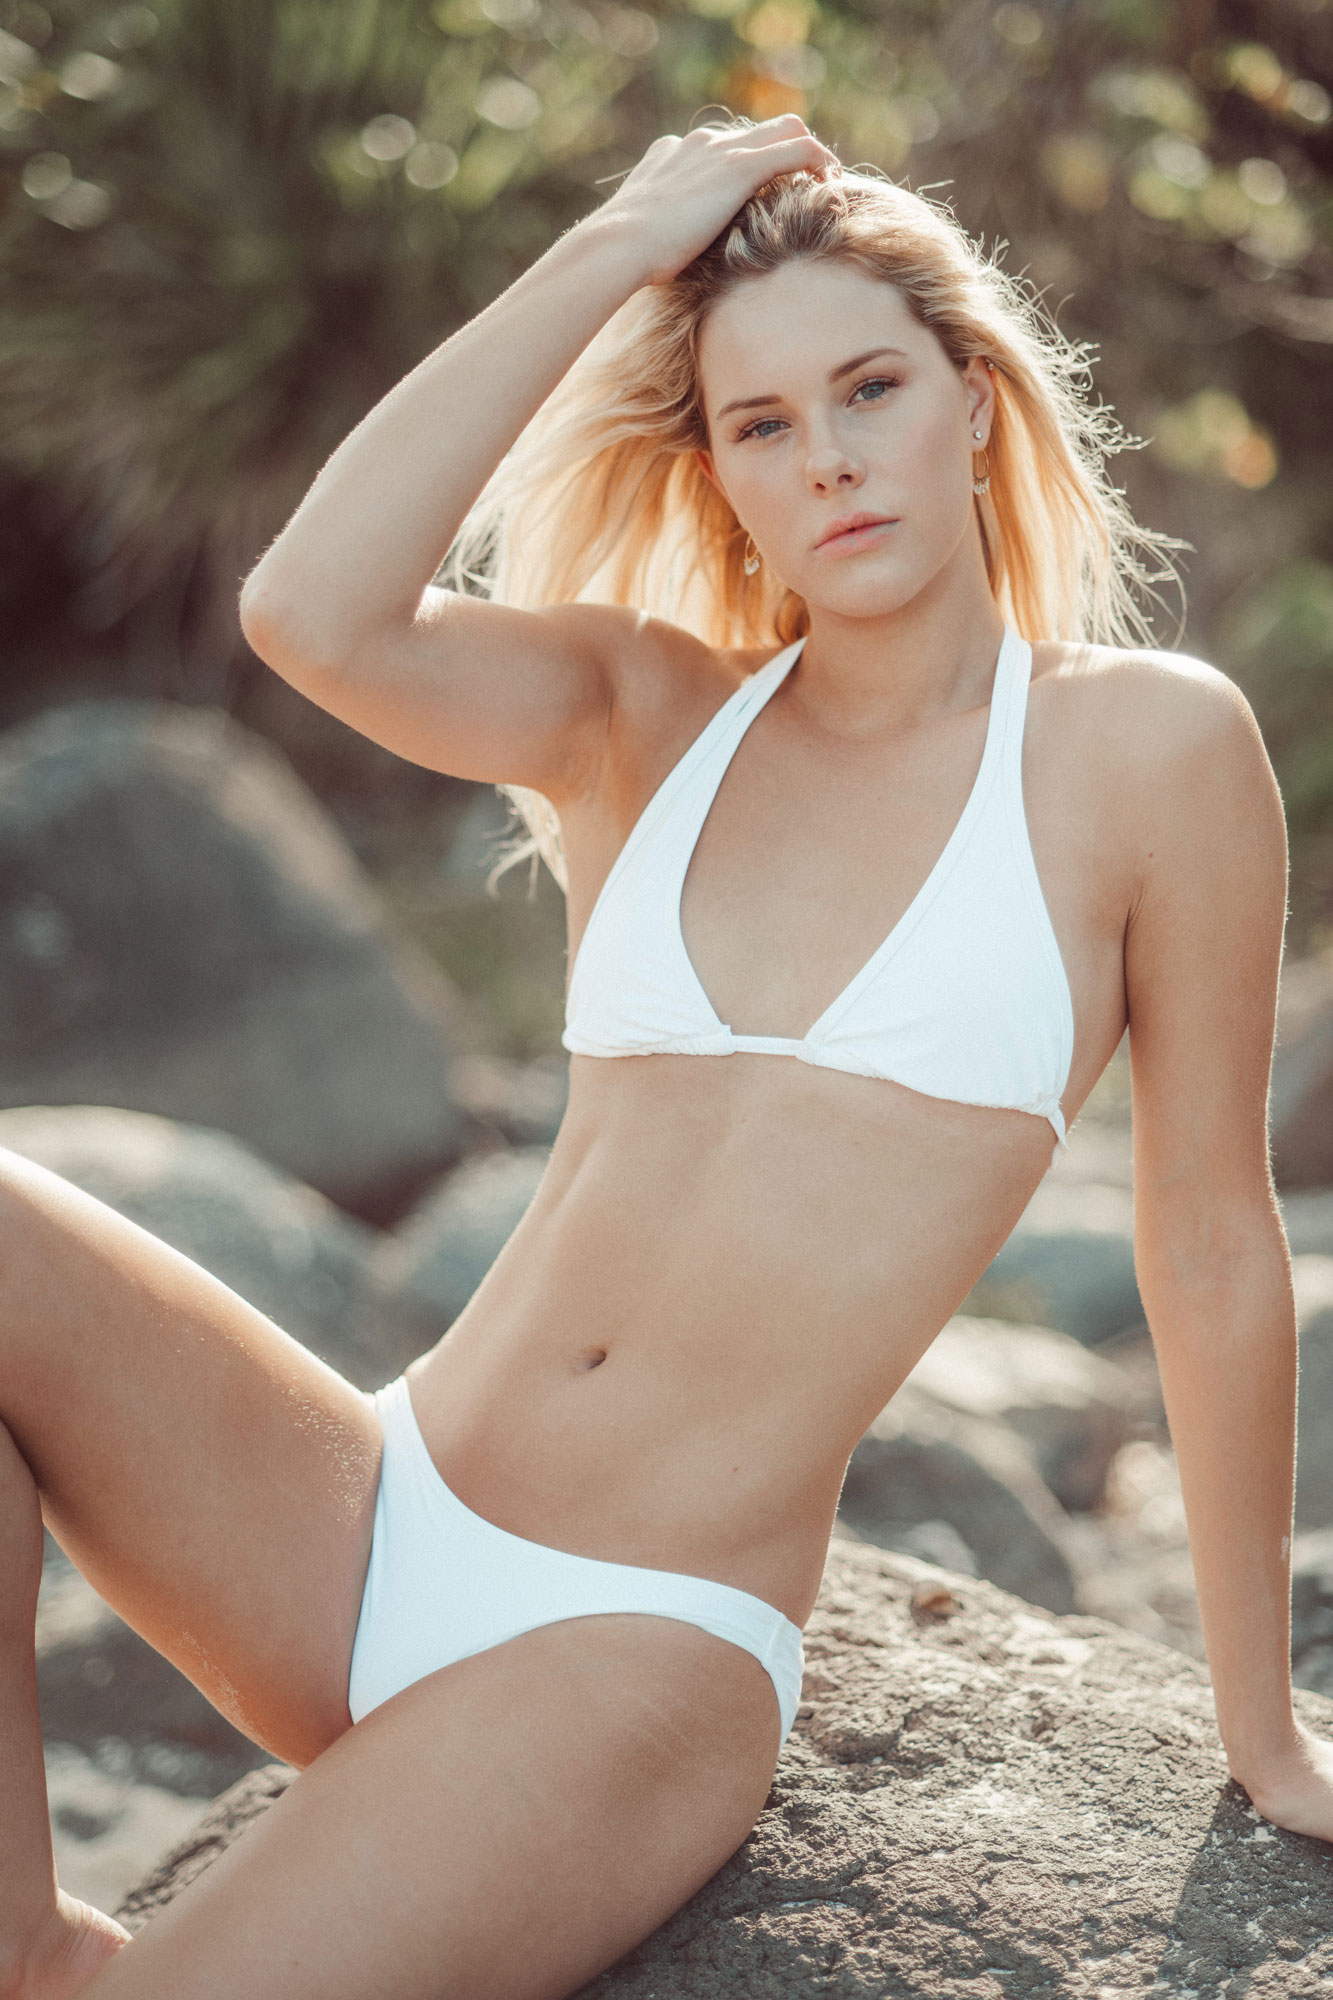 Ethical-White-Bikini-Swimwear-Lily-Goodare-Gold-Coast-Model-by-Photographer-Kim-Akrigg-in-Liar-the-Label.jpg